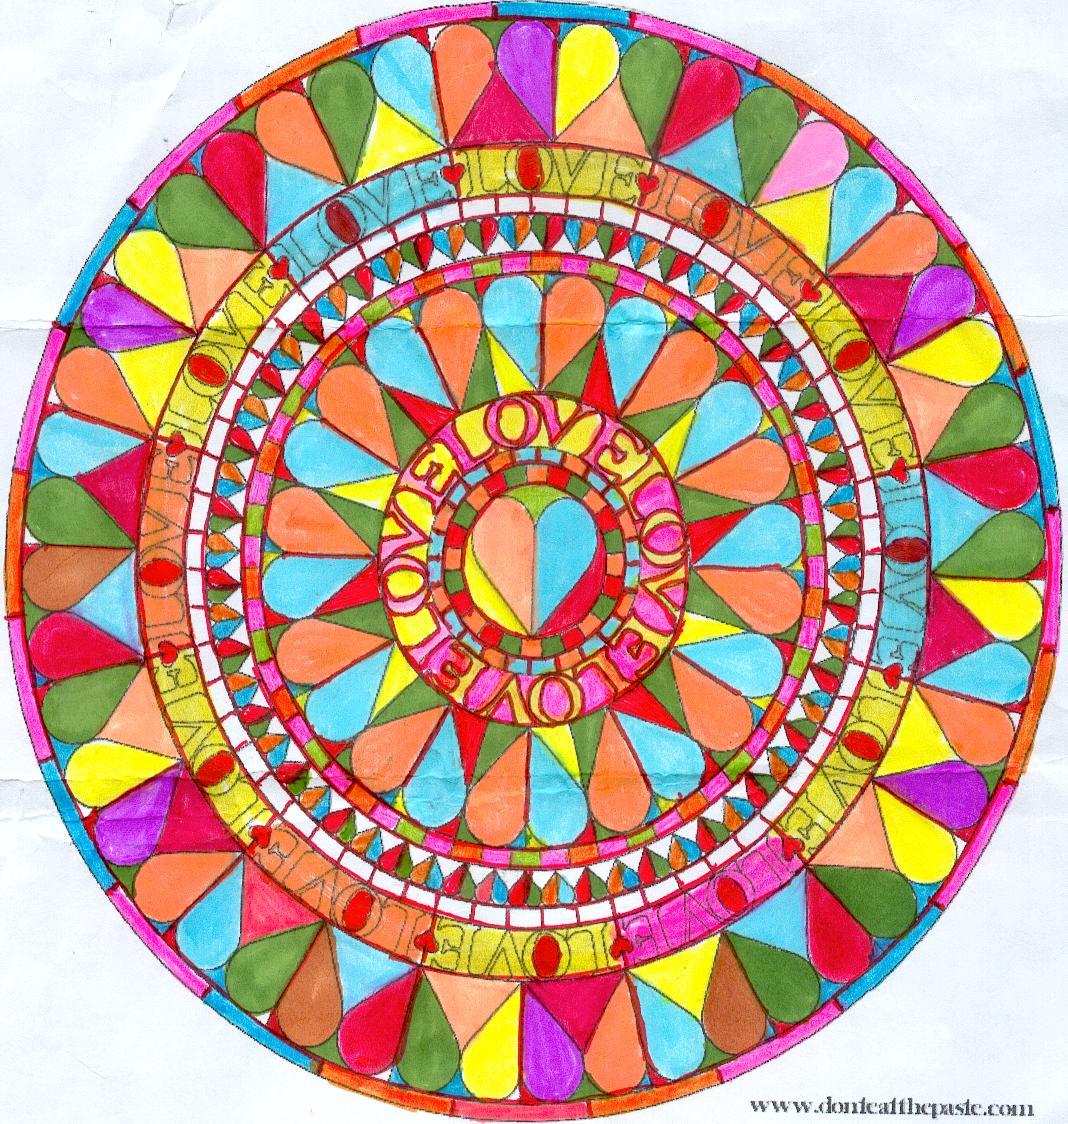 Mandala coeur de toutes les couleurs jeu khanel domandalas - Mandala de coeur ...